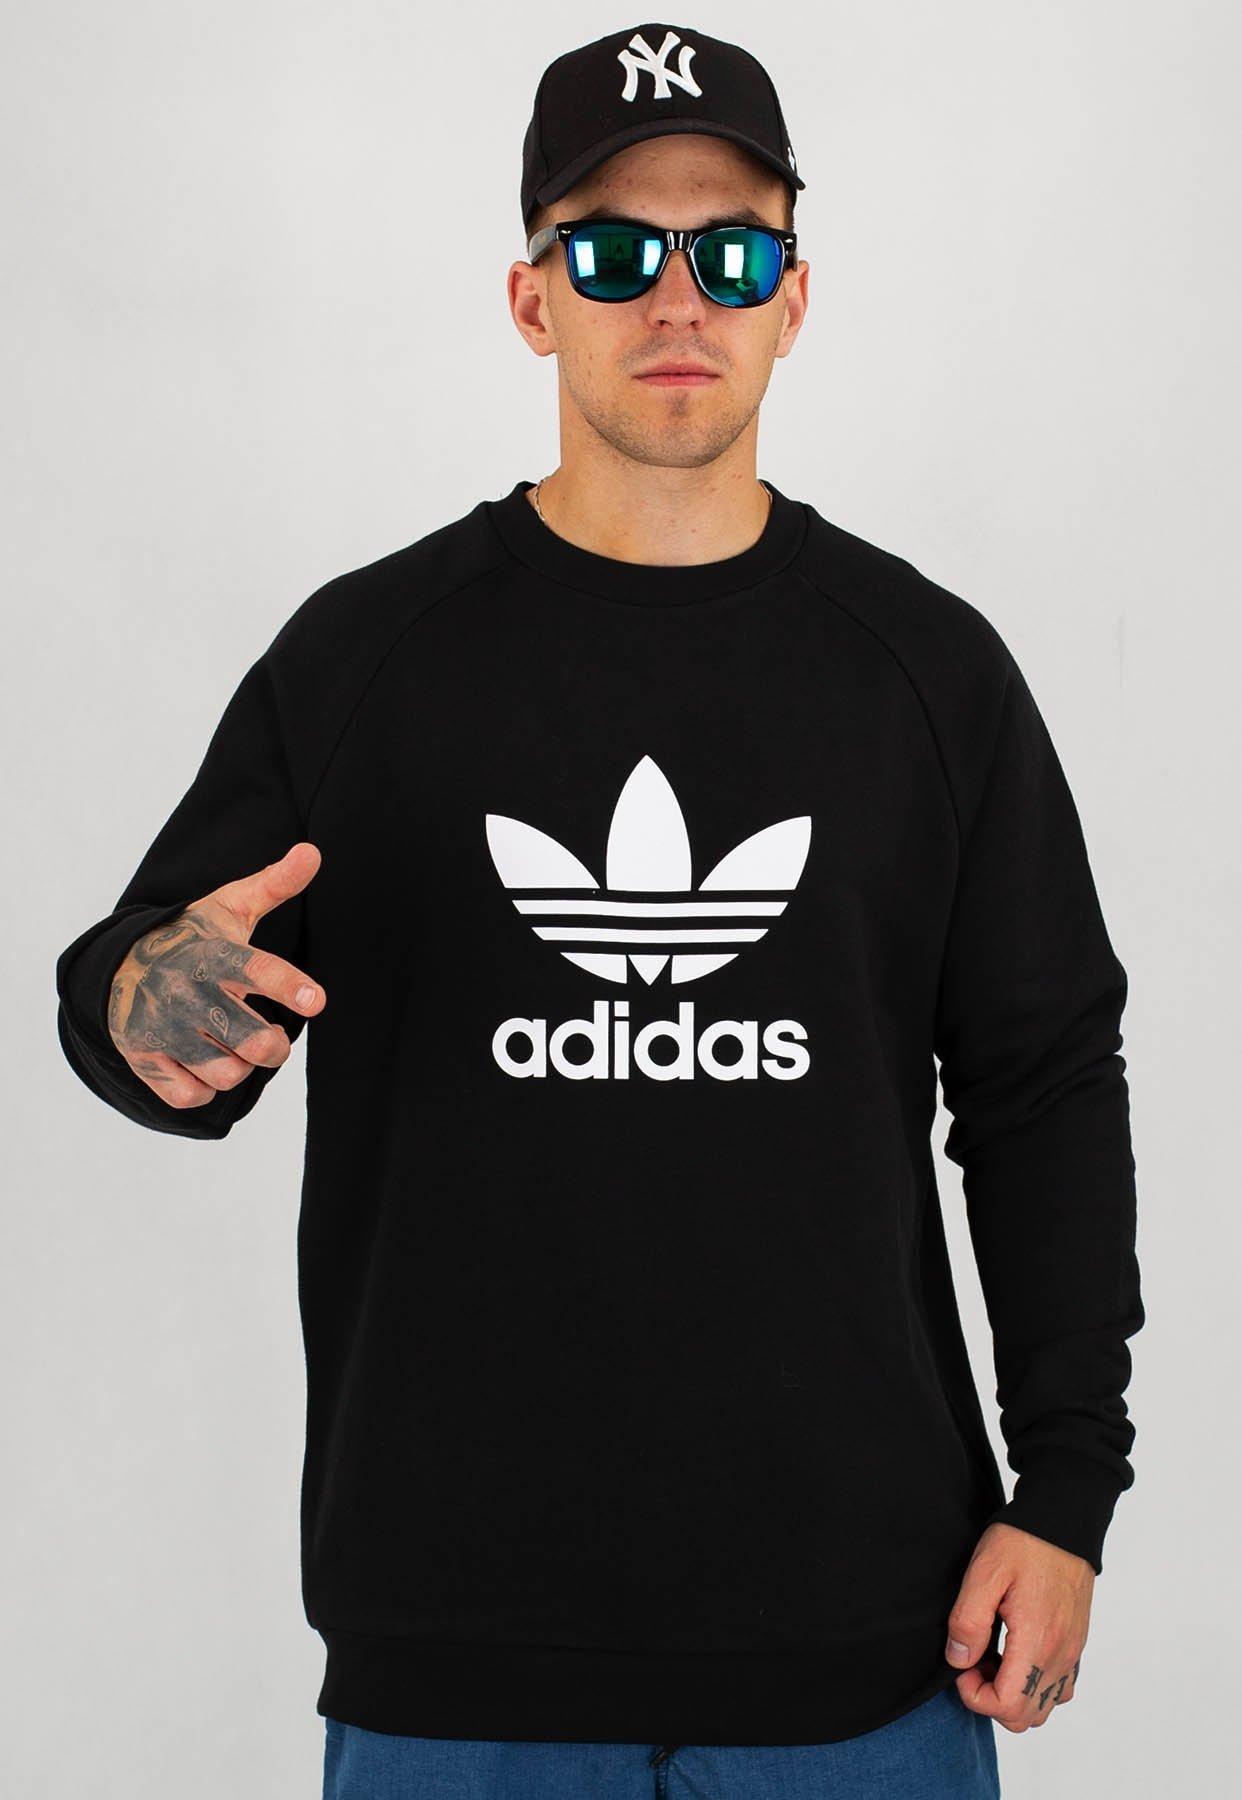 adidas bluza czarna